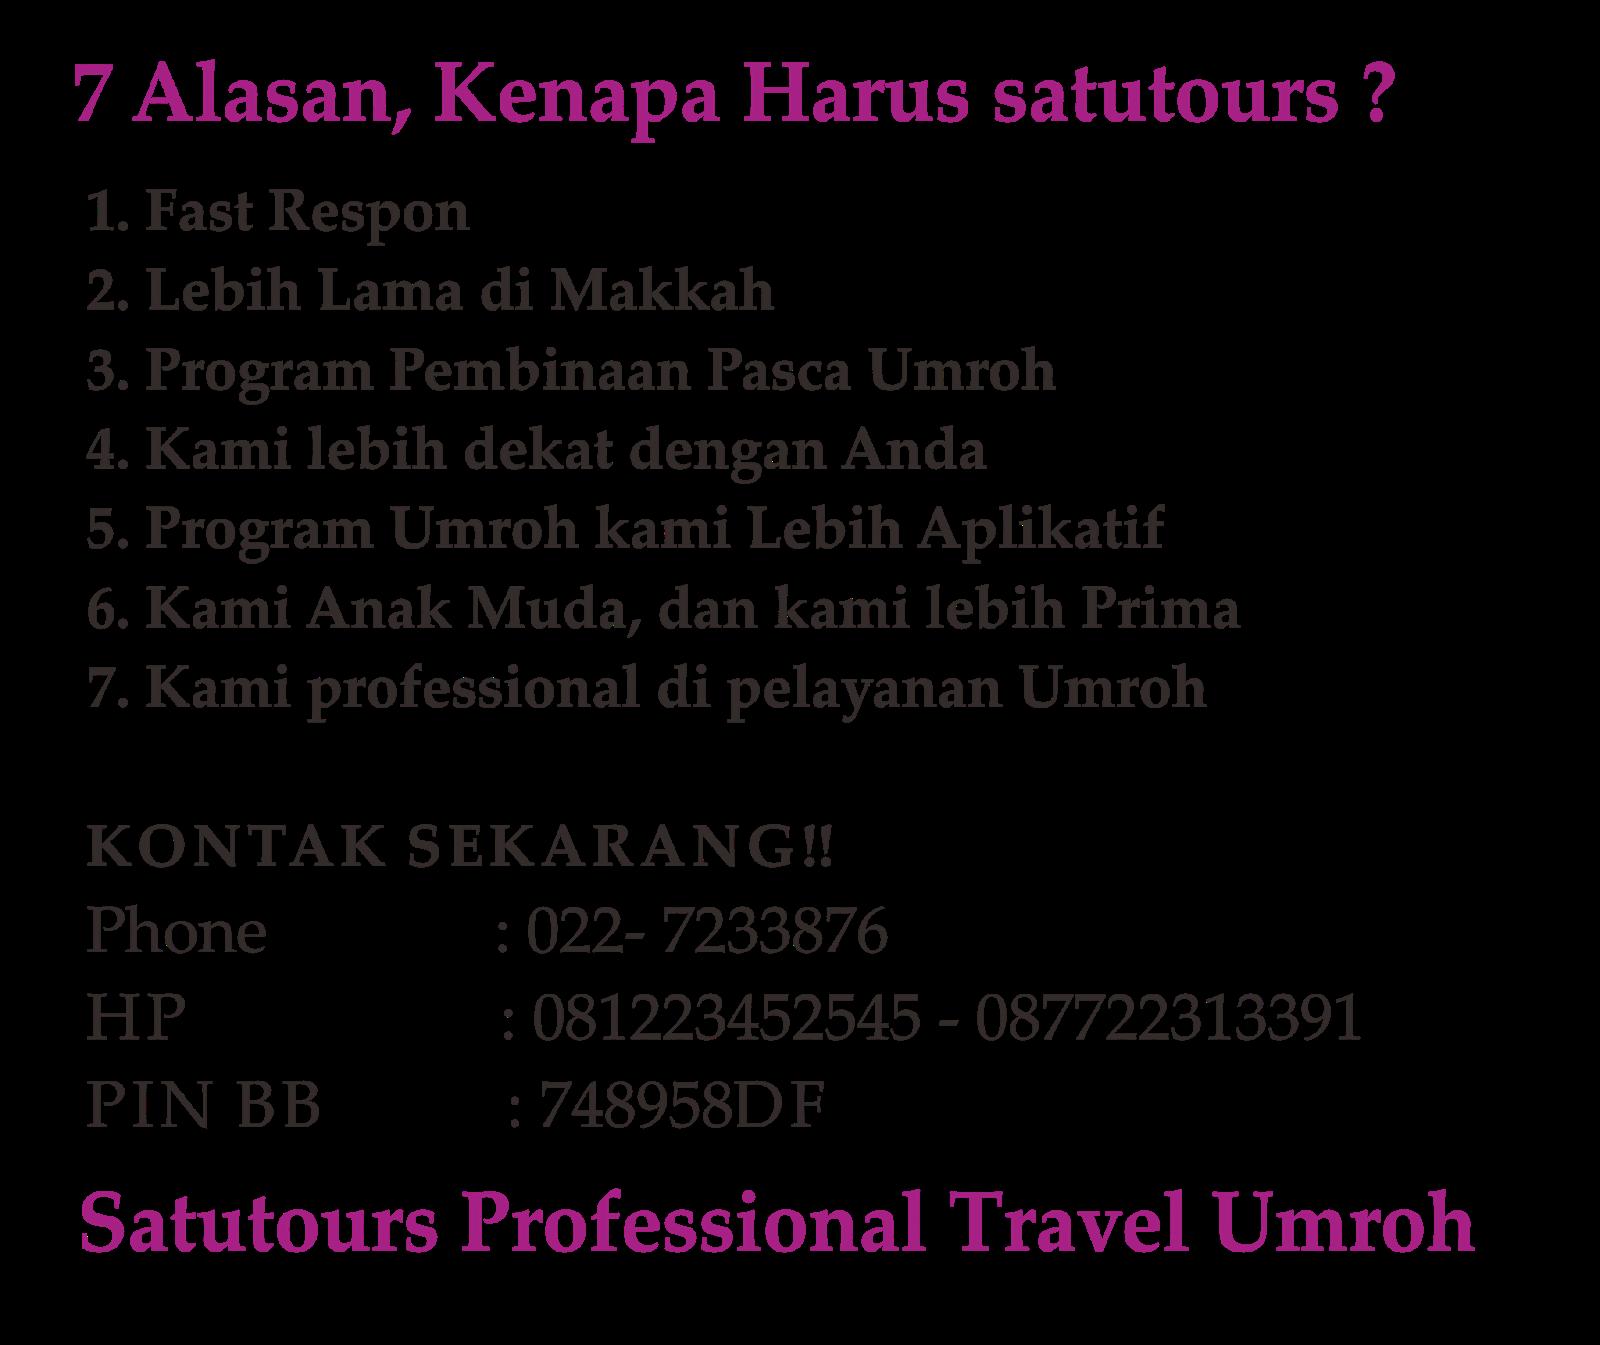 Harga Paket Umroh 2014 Bandung